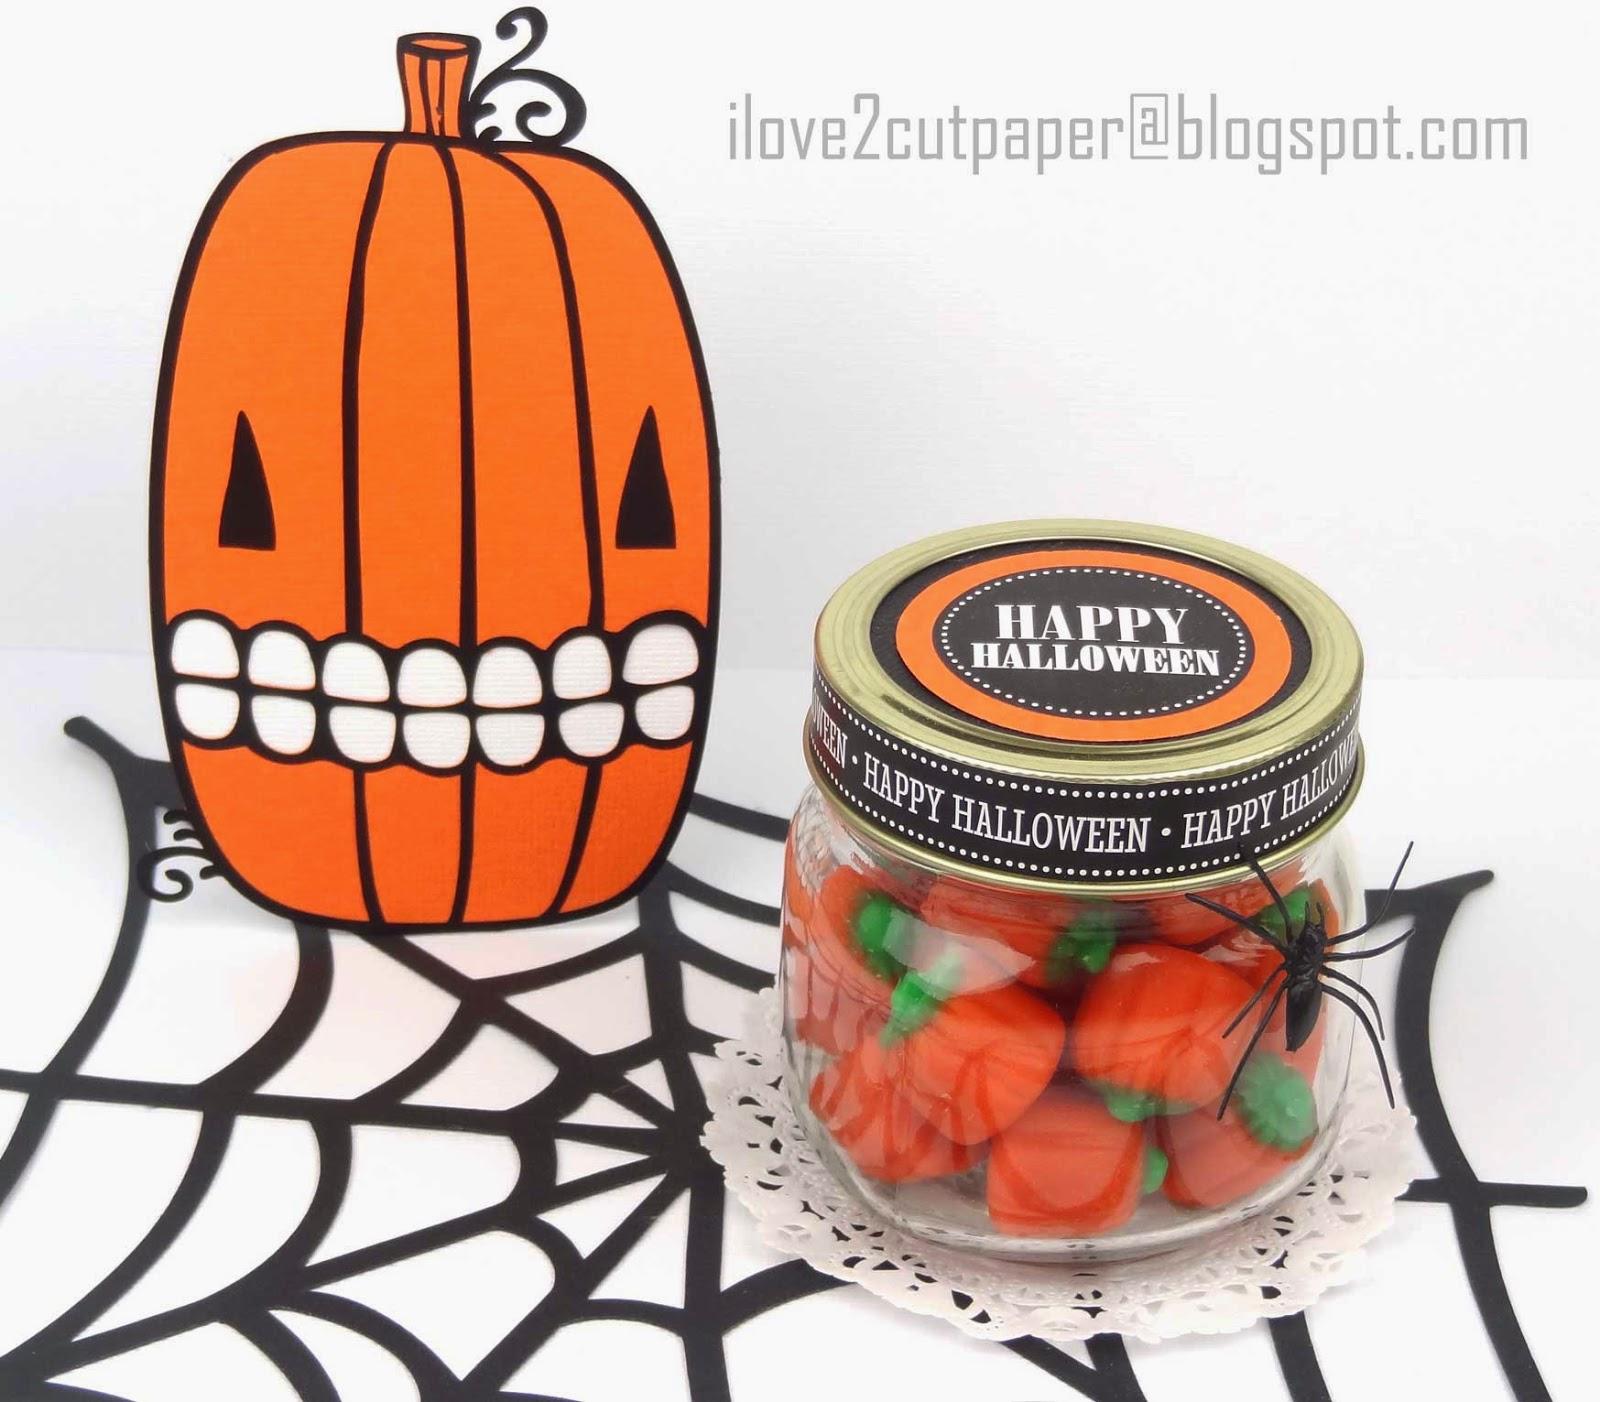 SRM Halloween Stickers for Halloween Gift